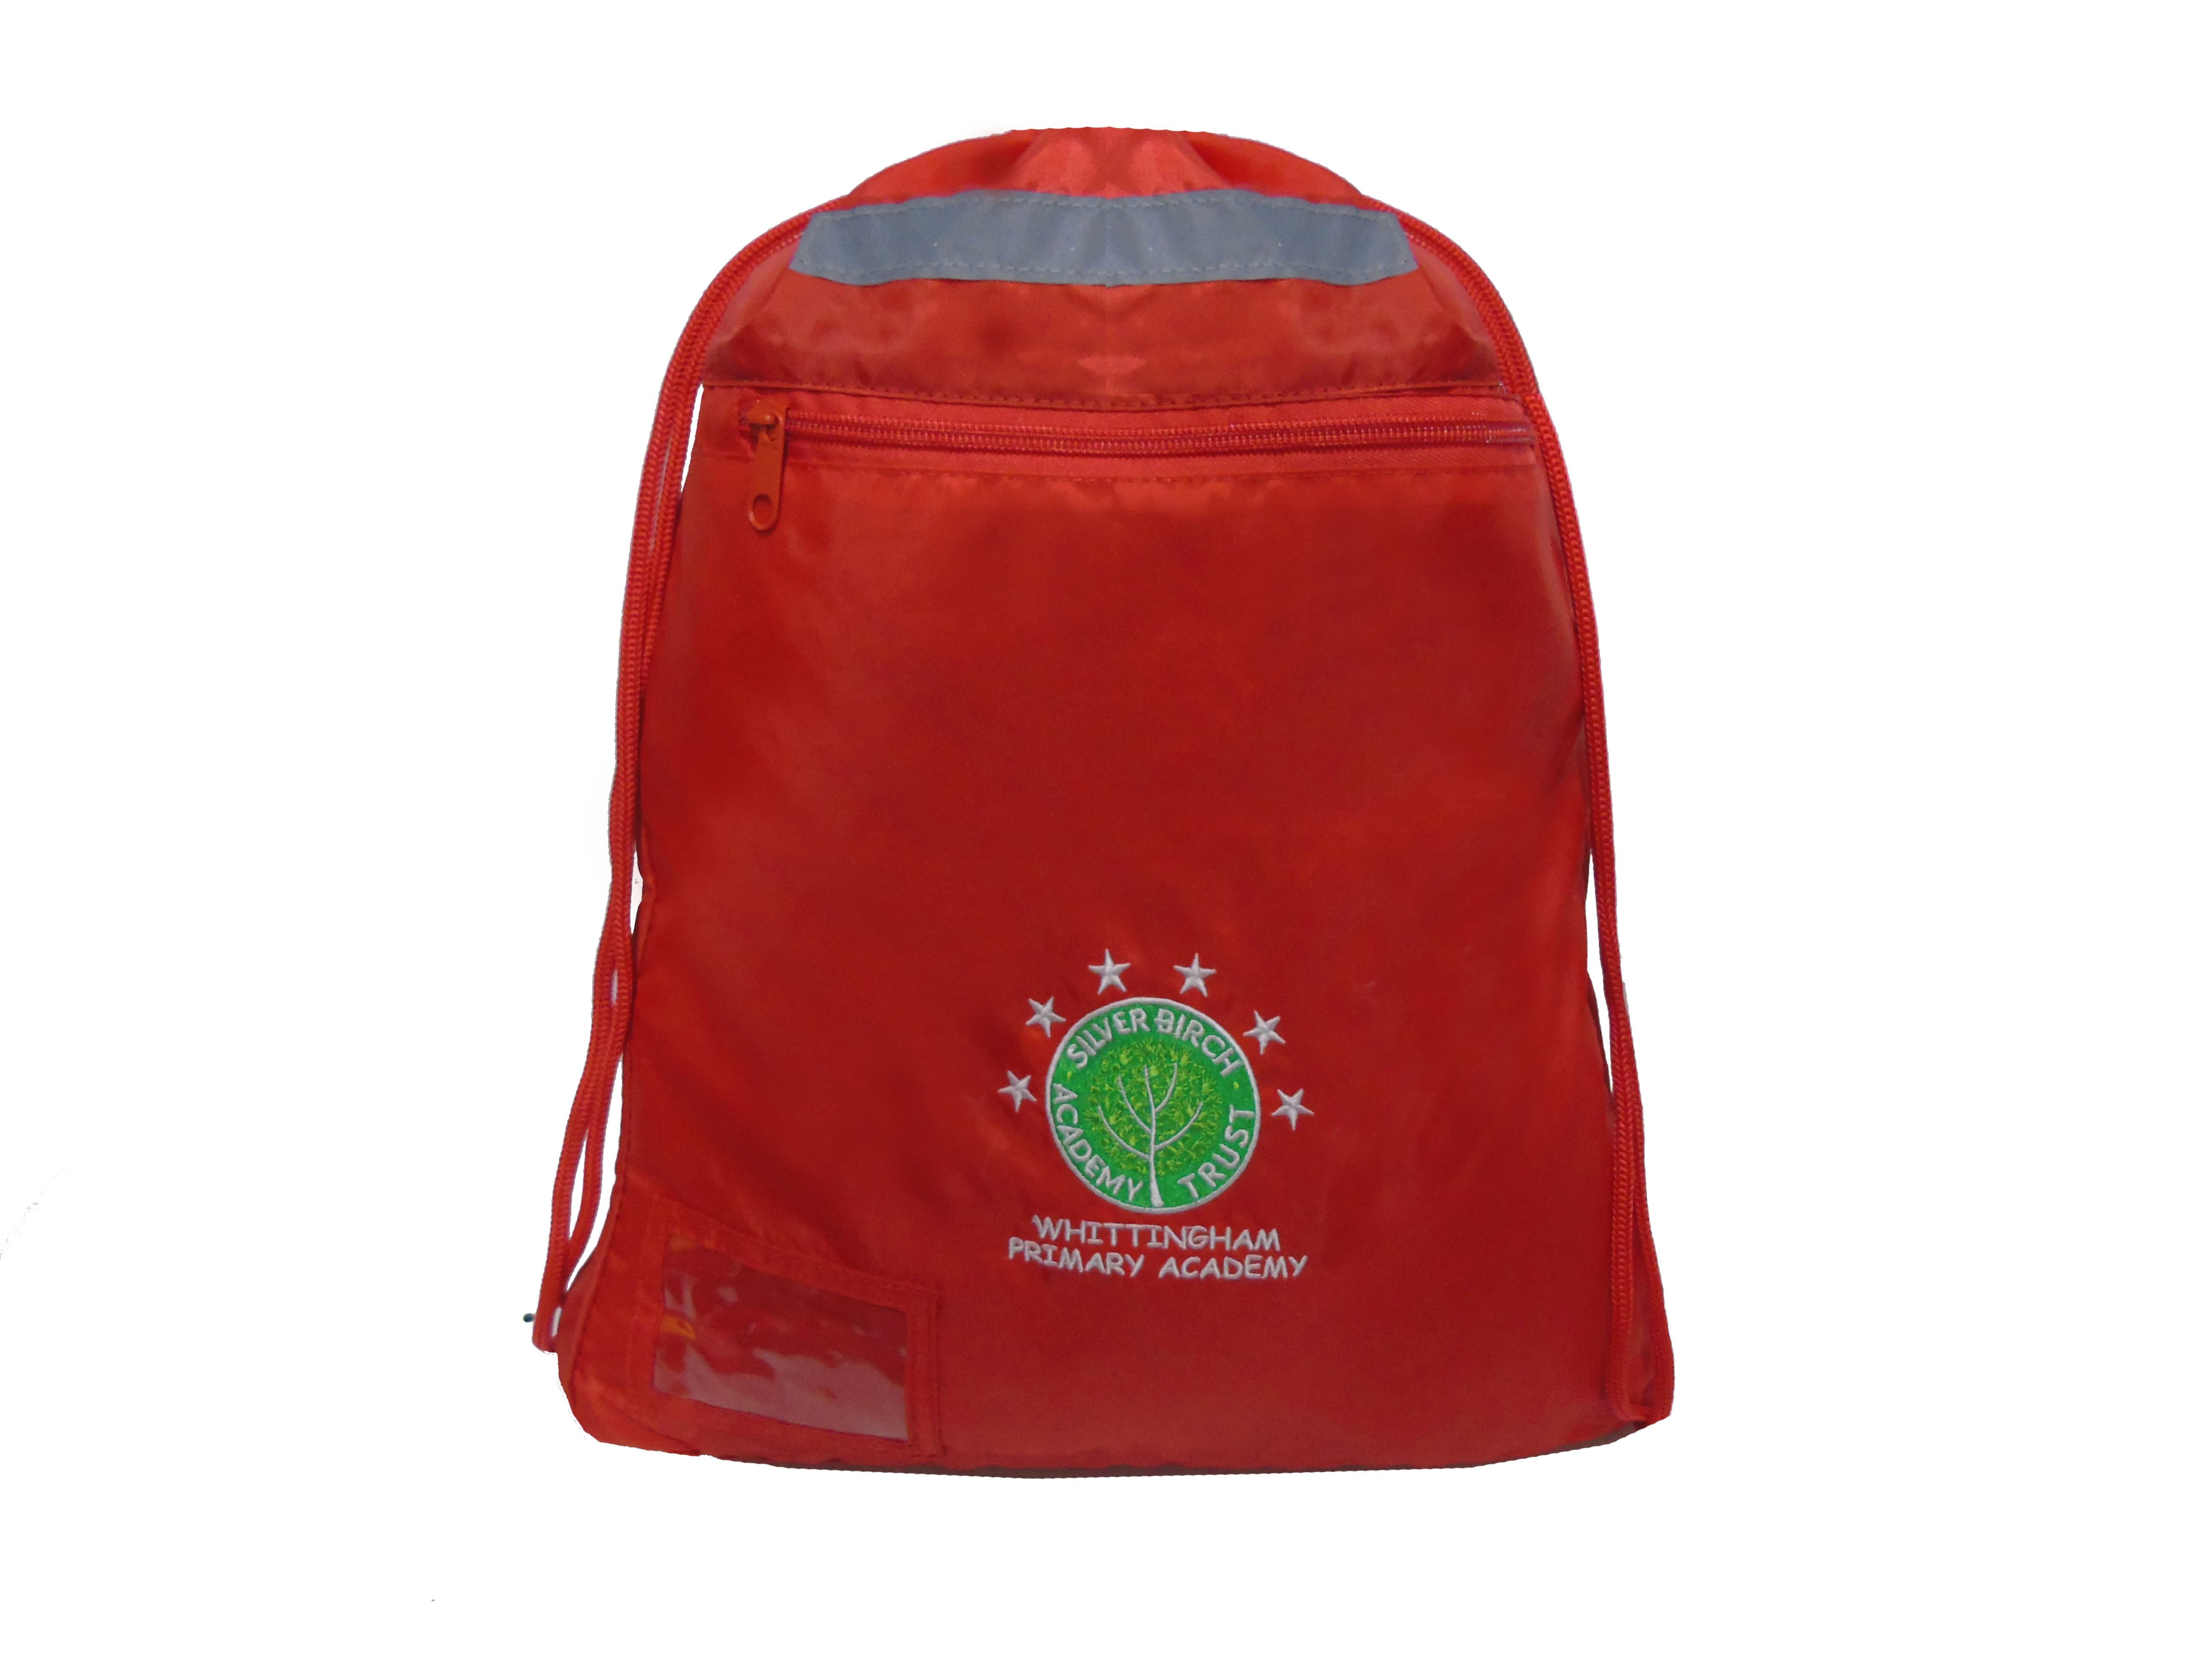 Whittingham P.E Bag